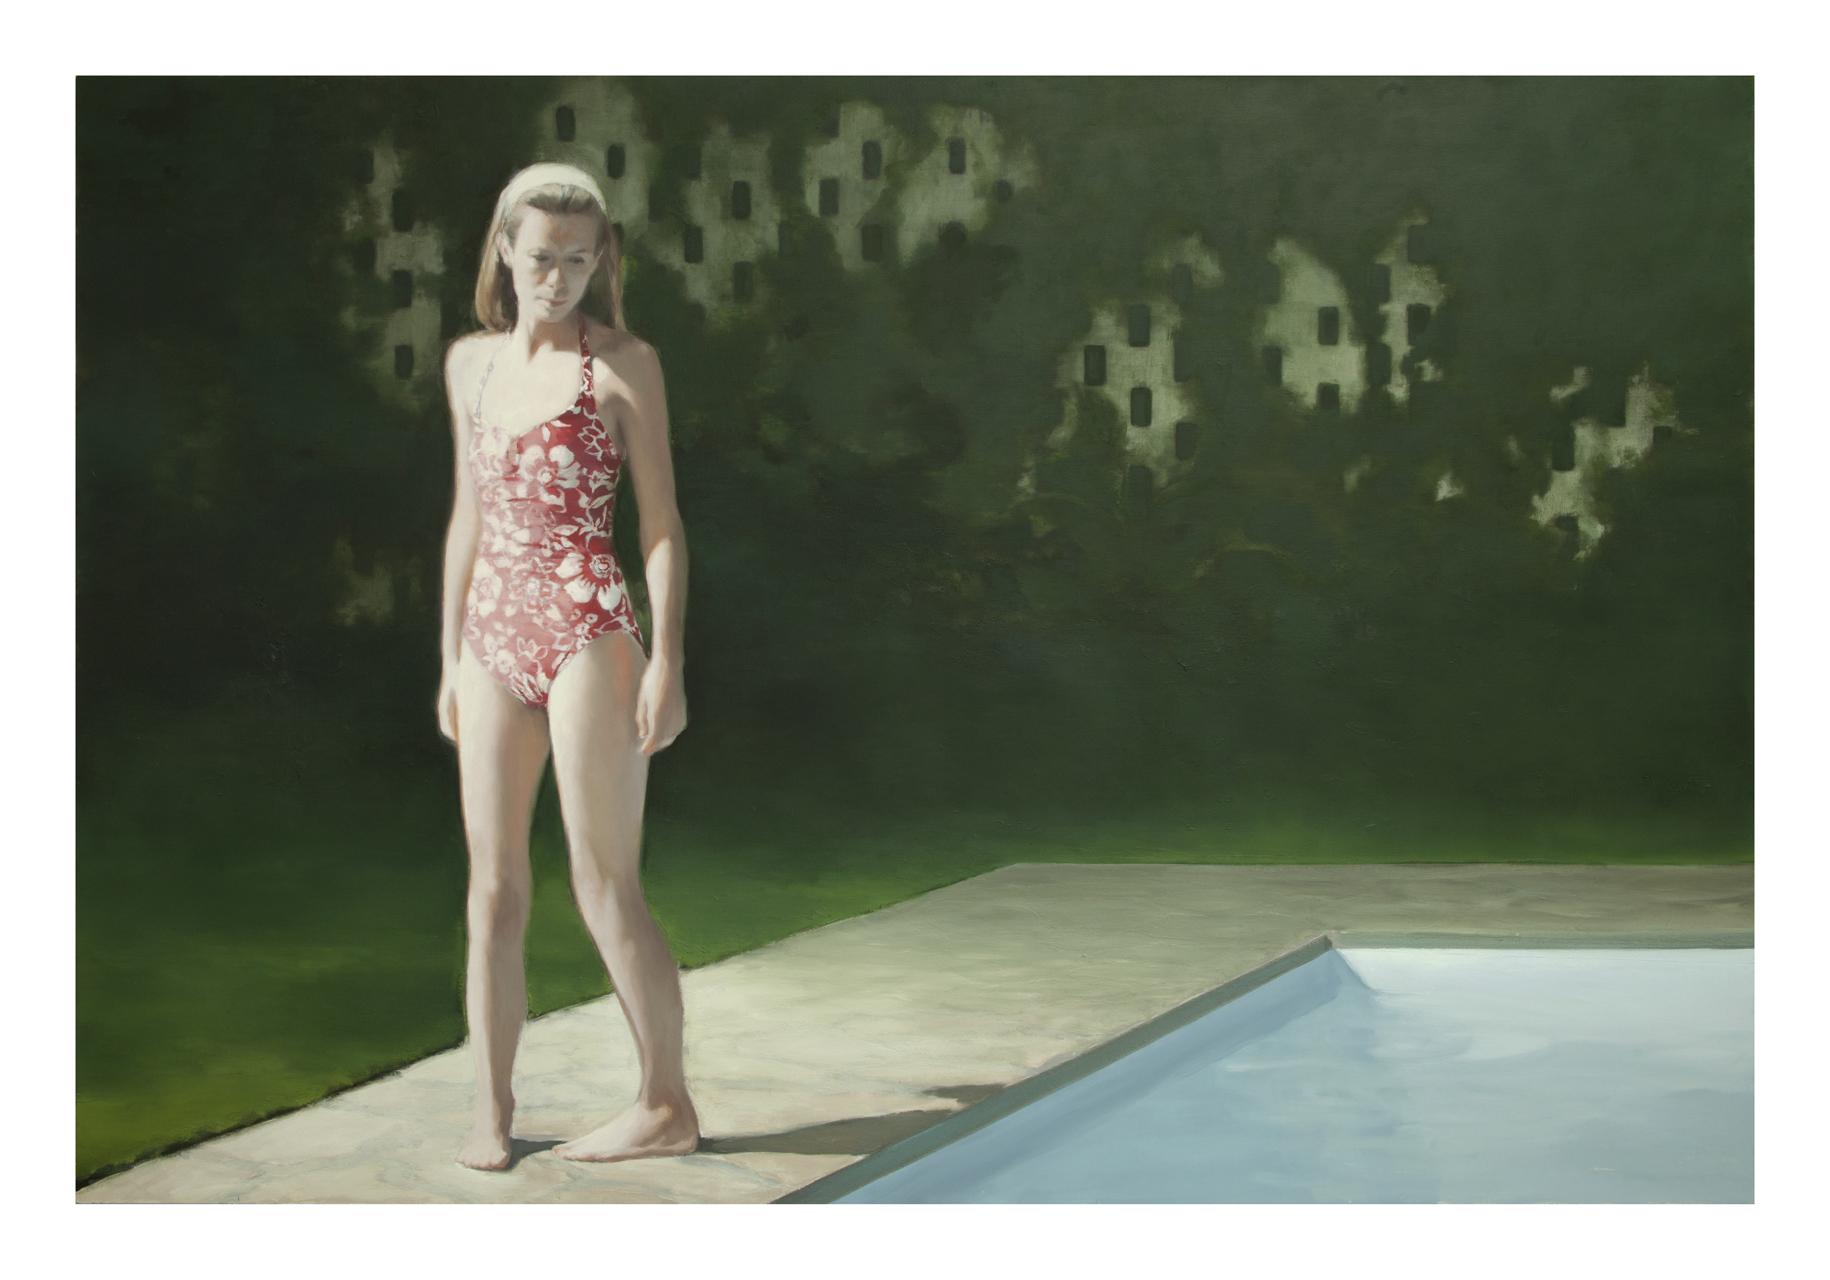 Jonathan Wateridge, Pool, 2017, Öl auf Leinwand, 180 x 270 cm